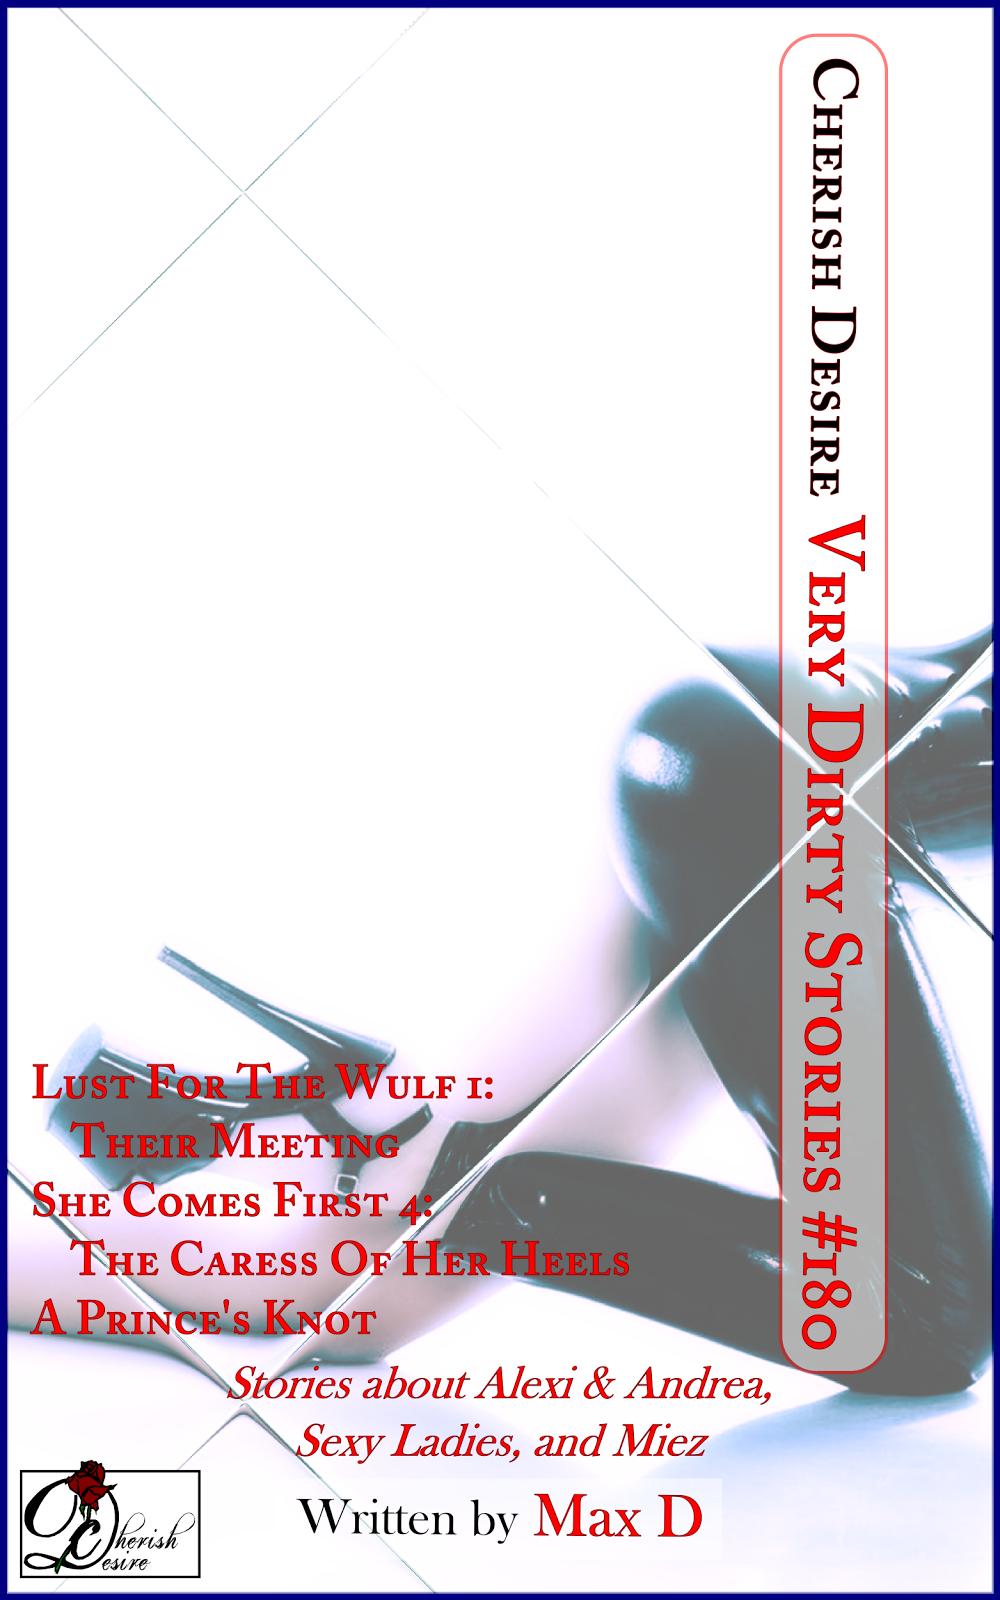 Cherish Desire: Very Dirty Stories #180, Max D, erotica